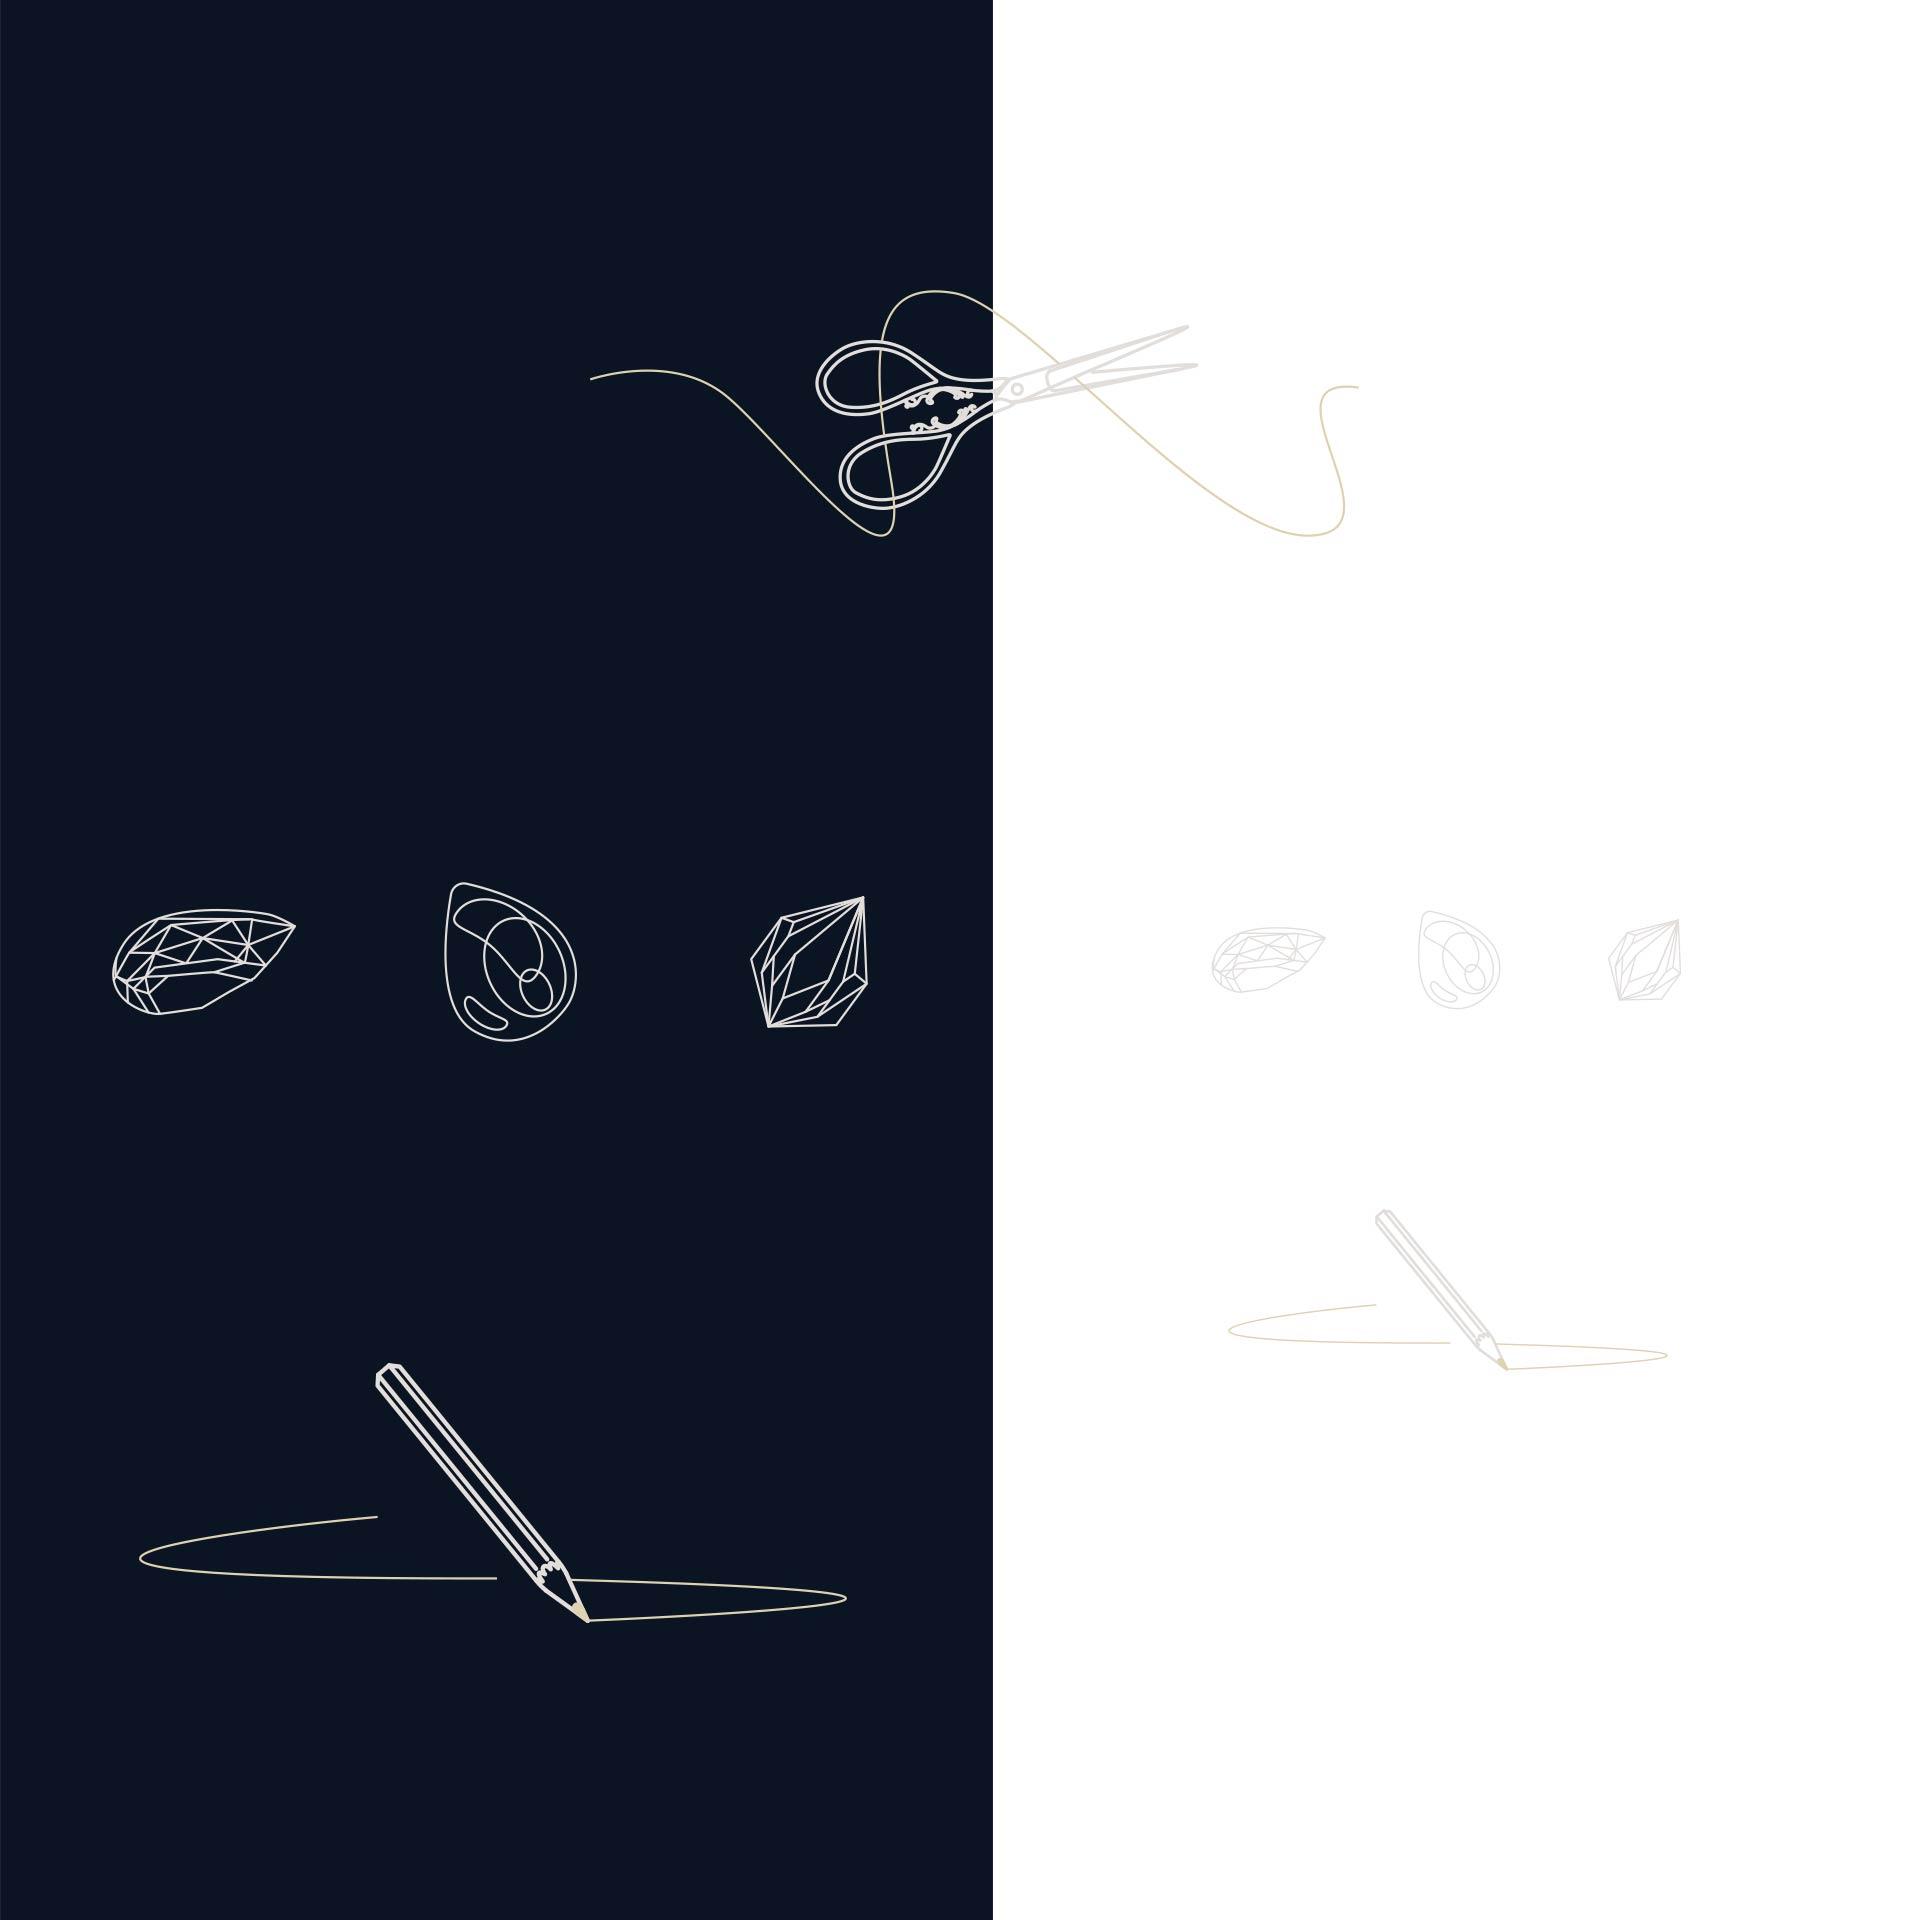 coelia lusso grafico milano icon 01